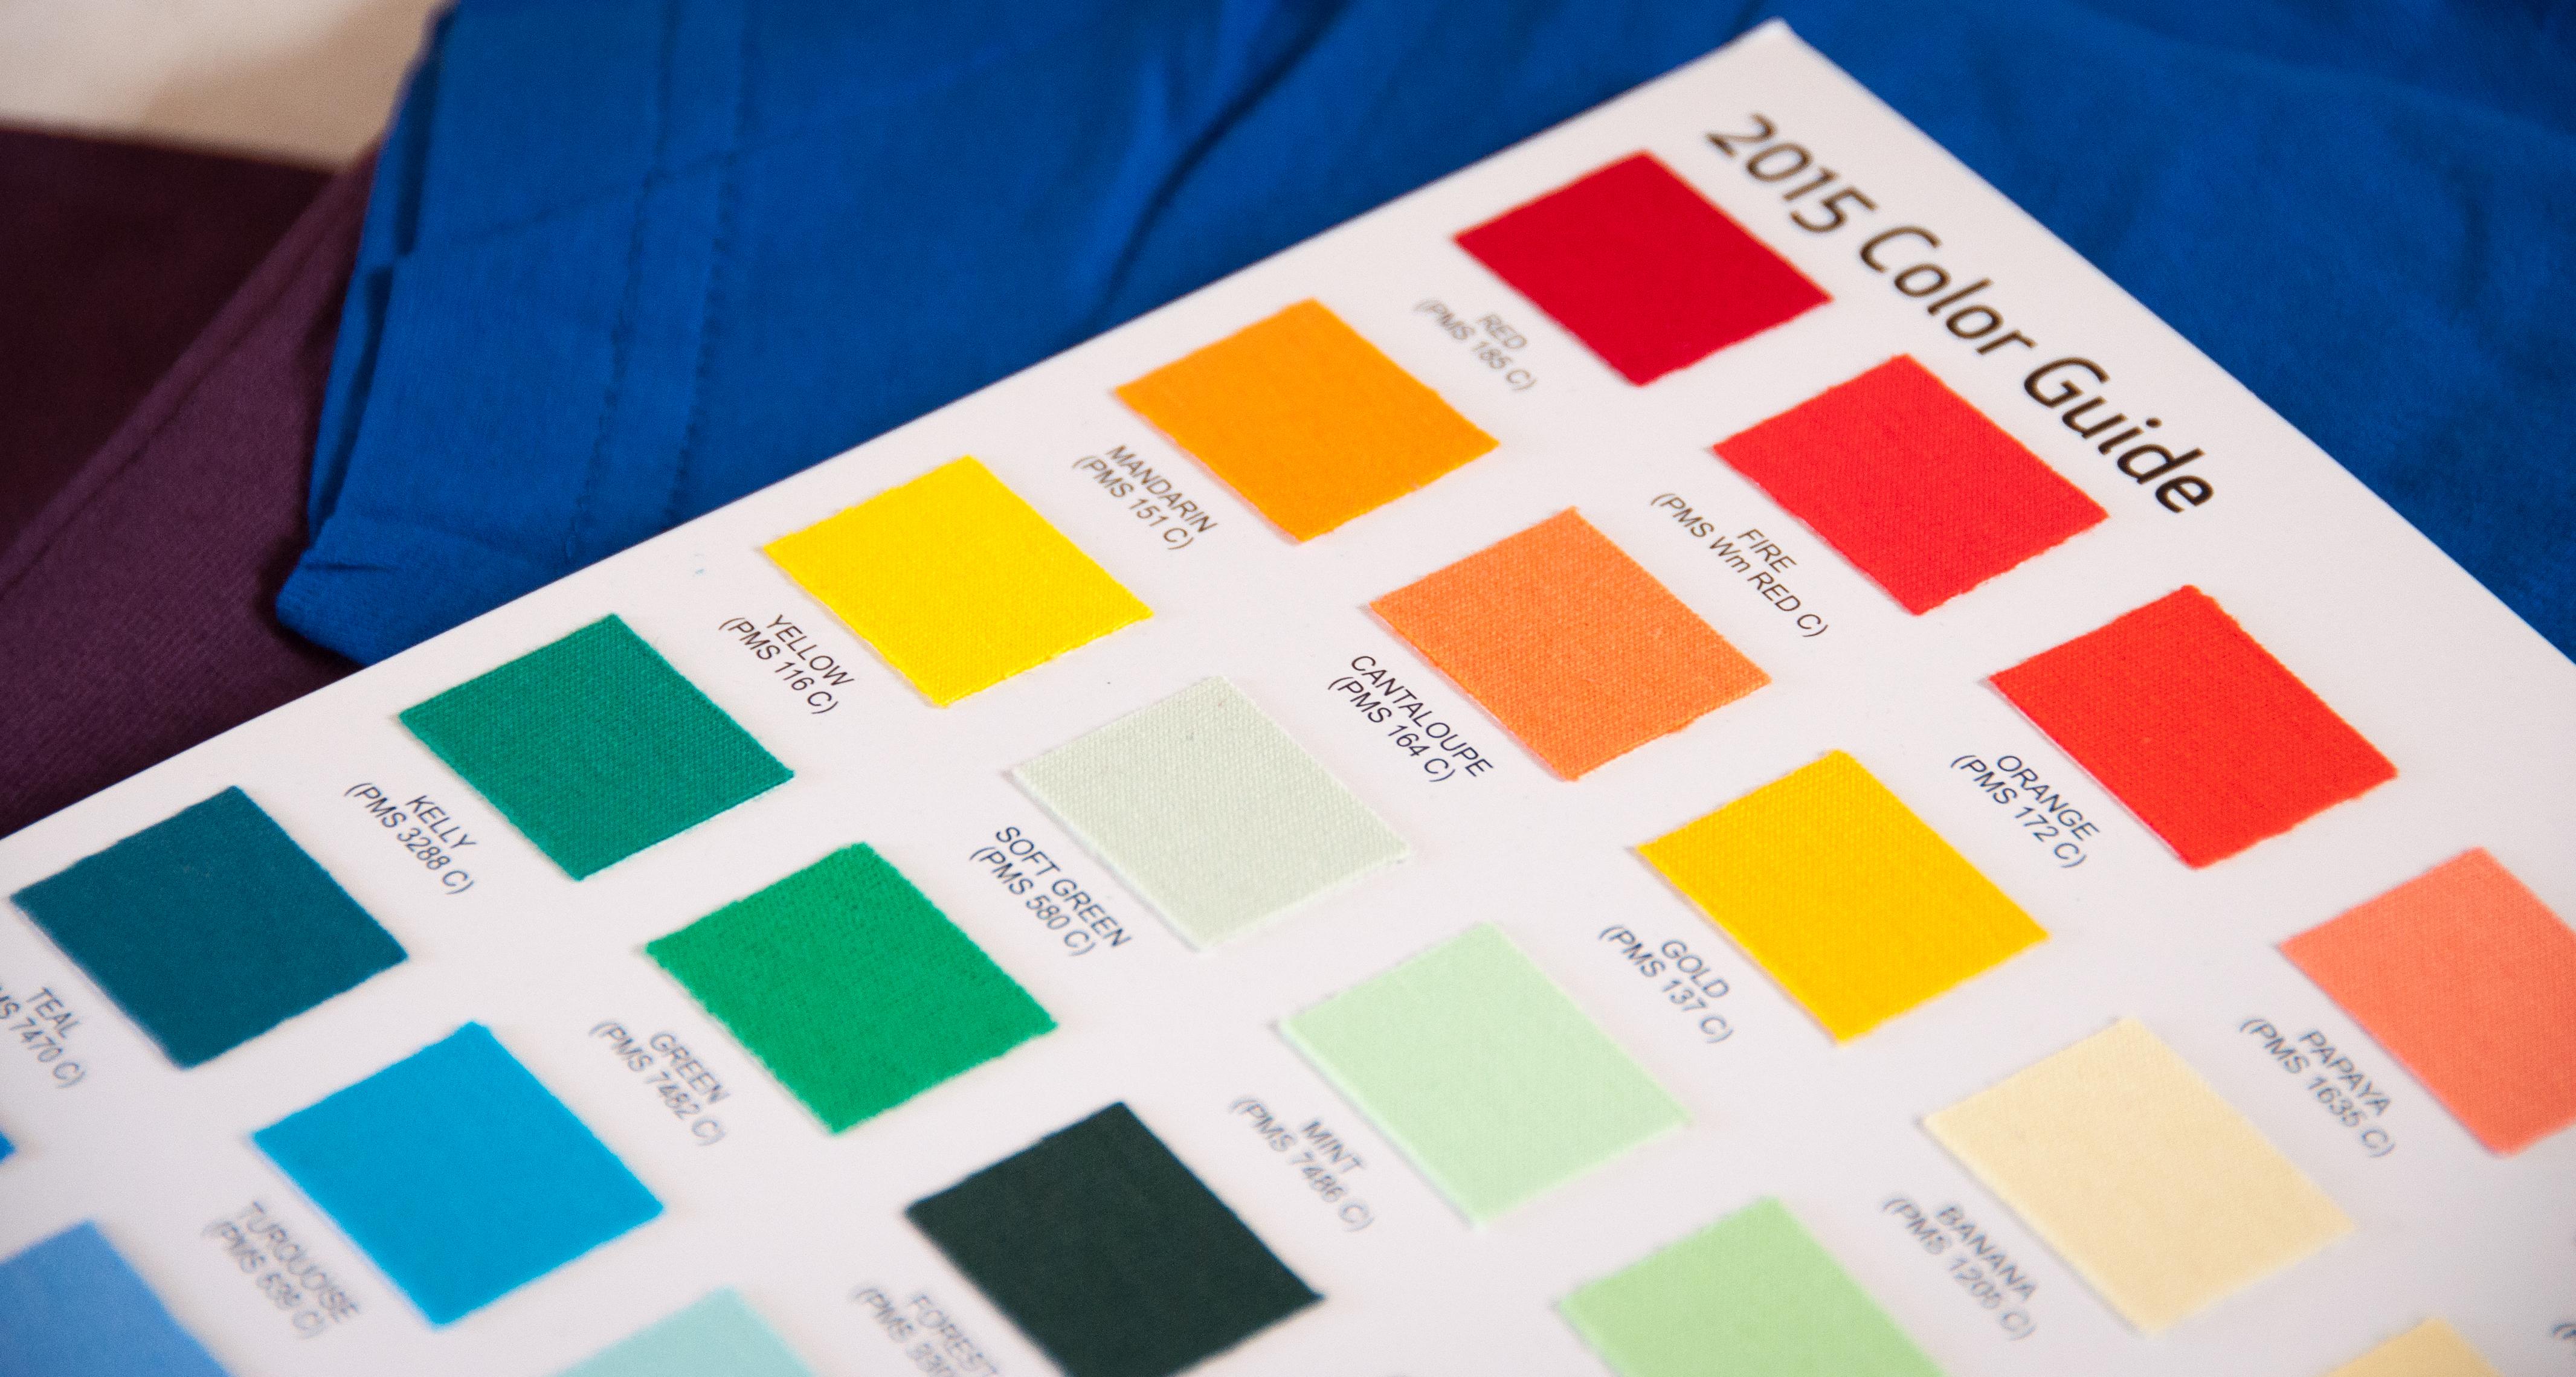 Design t shirt tips - Print Shop Custom T Shirt Printer